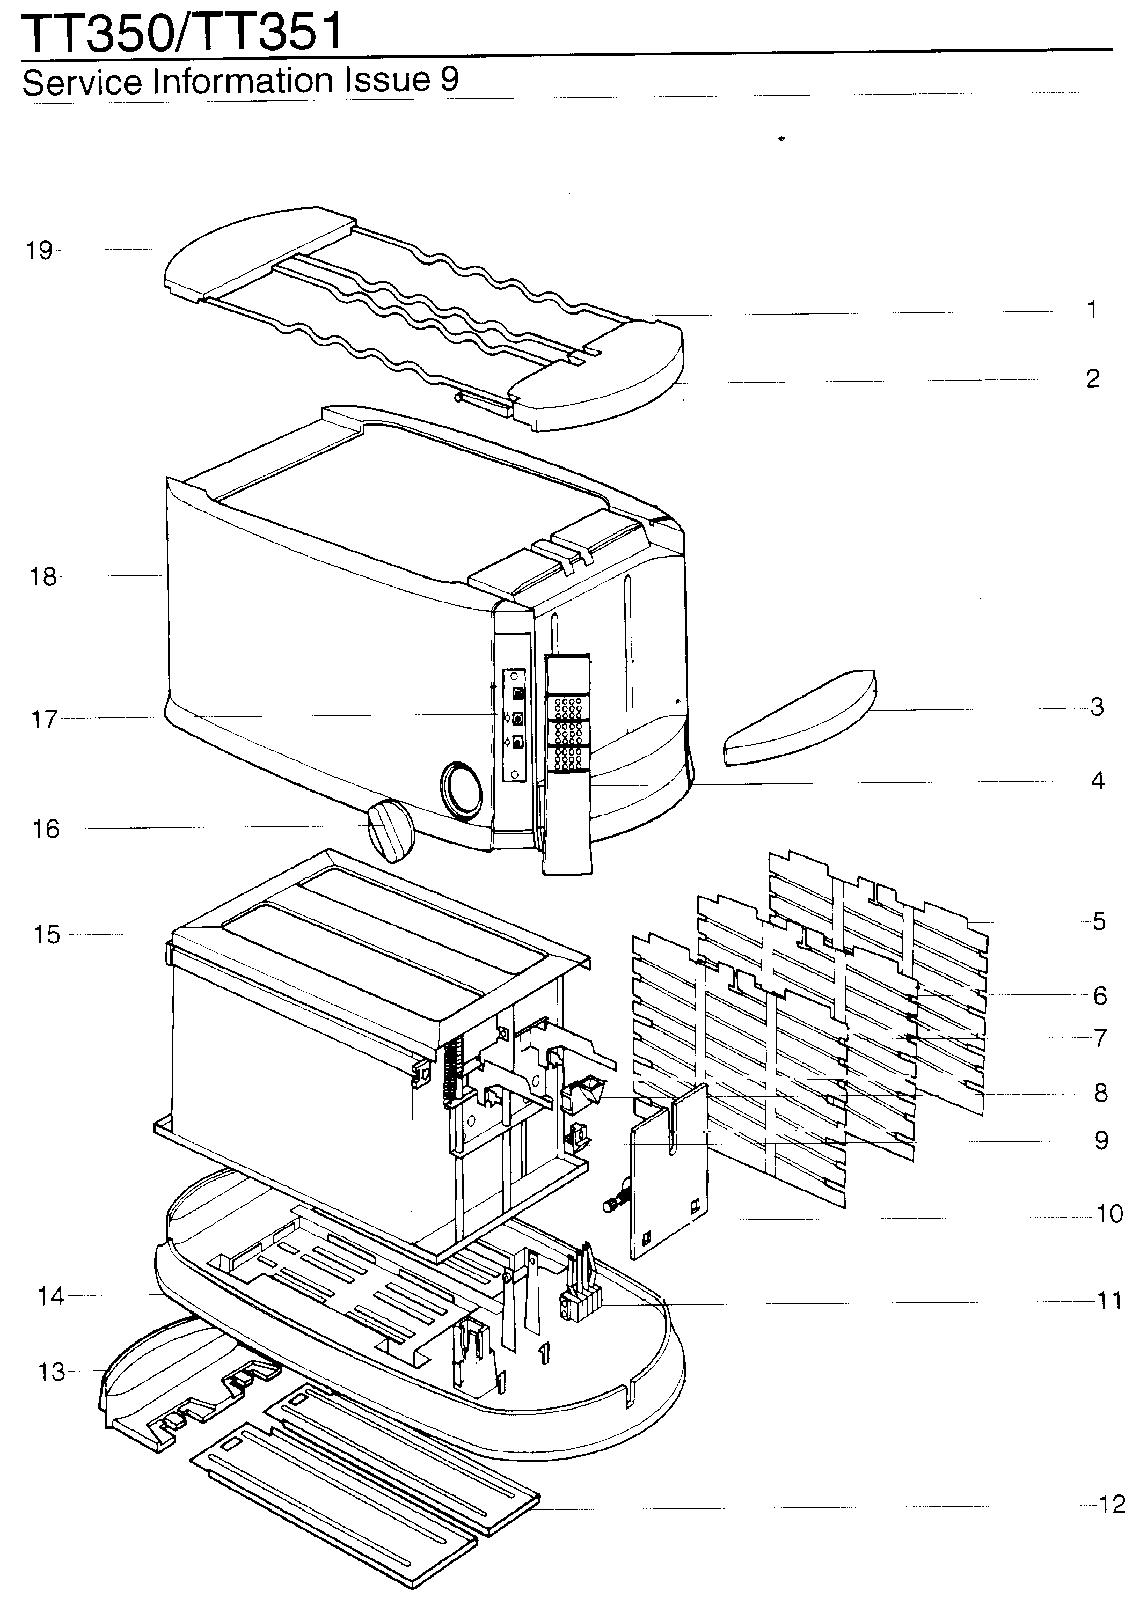 Kenwood Tt351 Toaster Spares Buyspares Wiring Diagram For